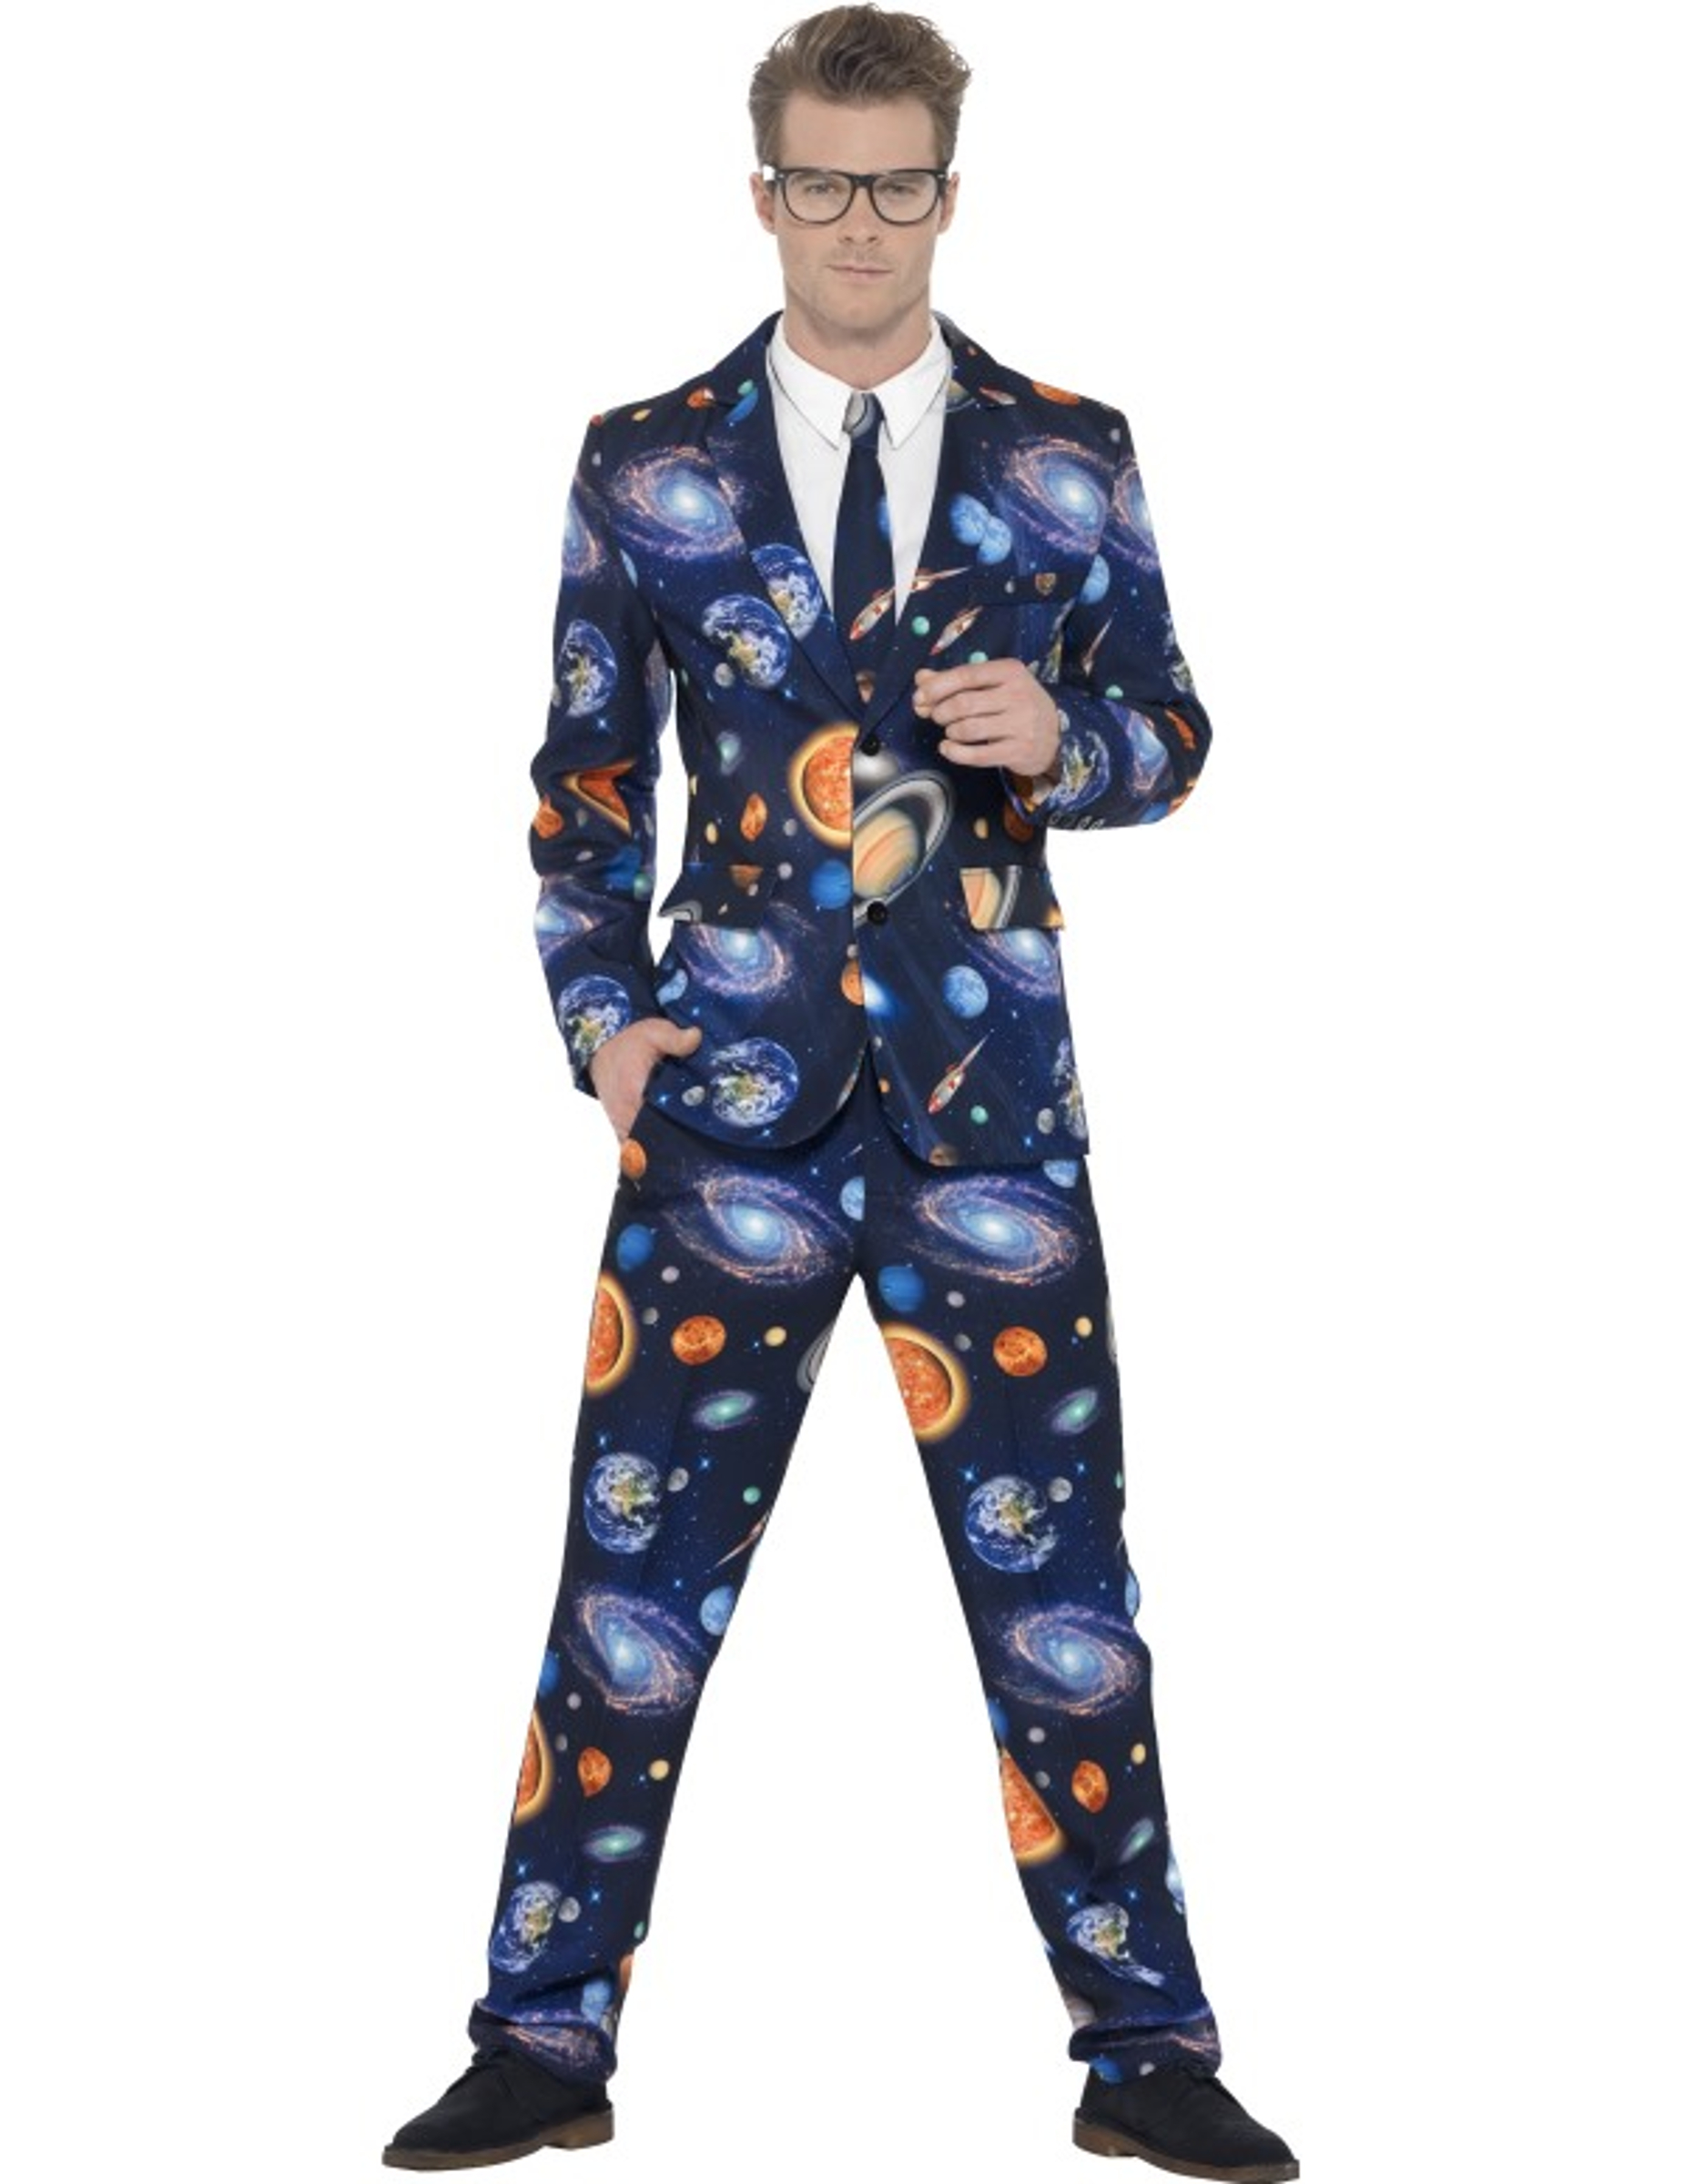 Costume Mr. Galaxie homme   Deguise-toi f6d03a775a2